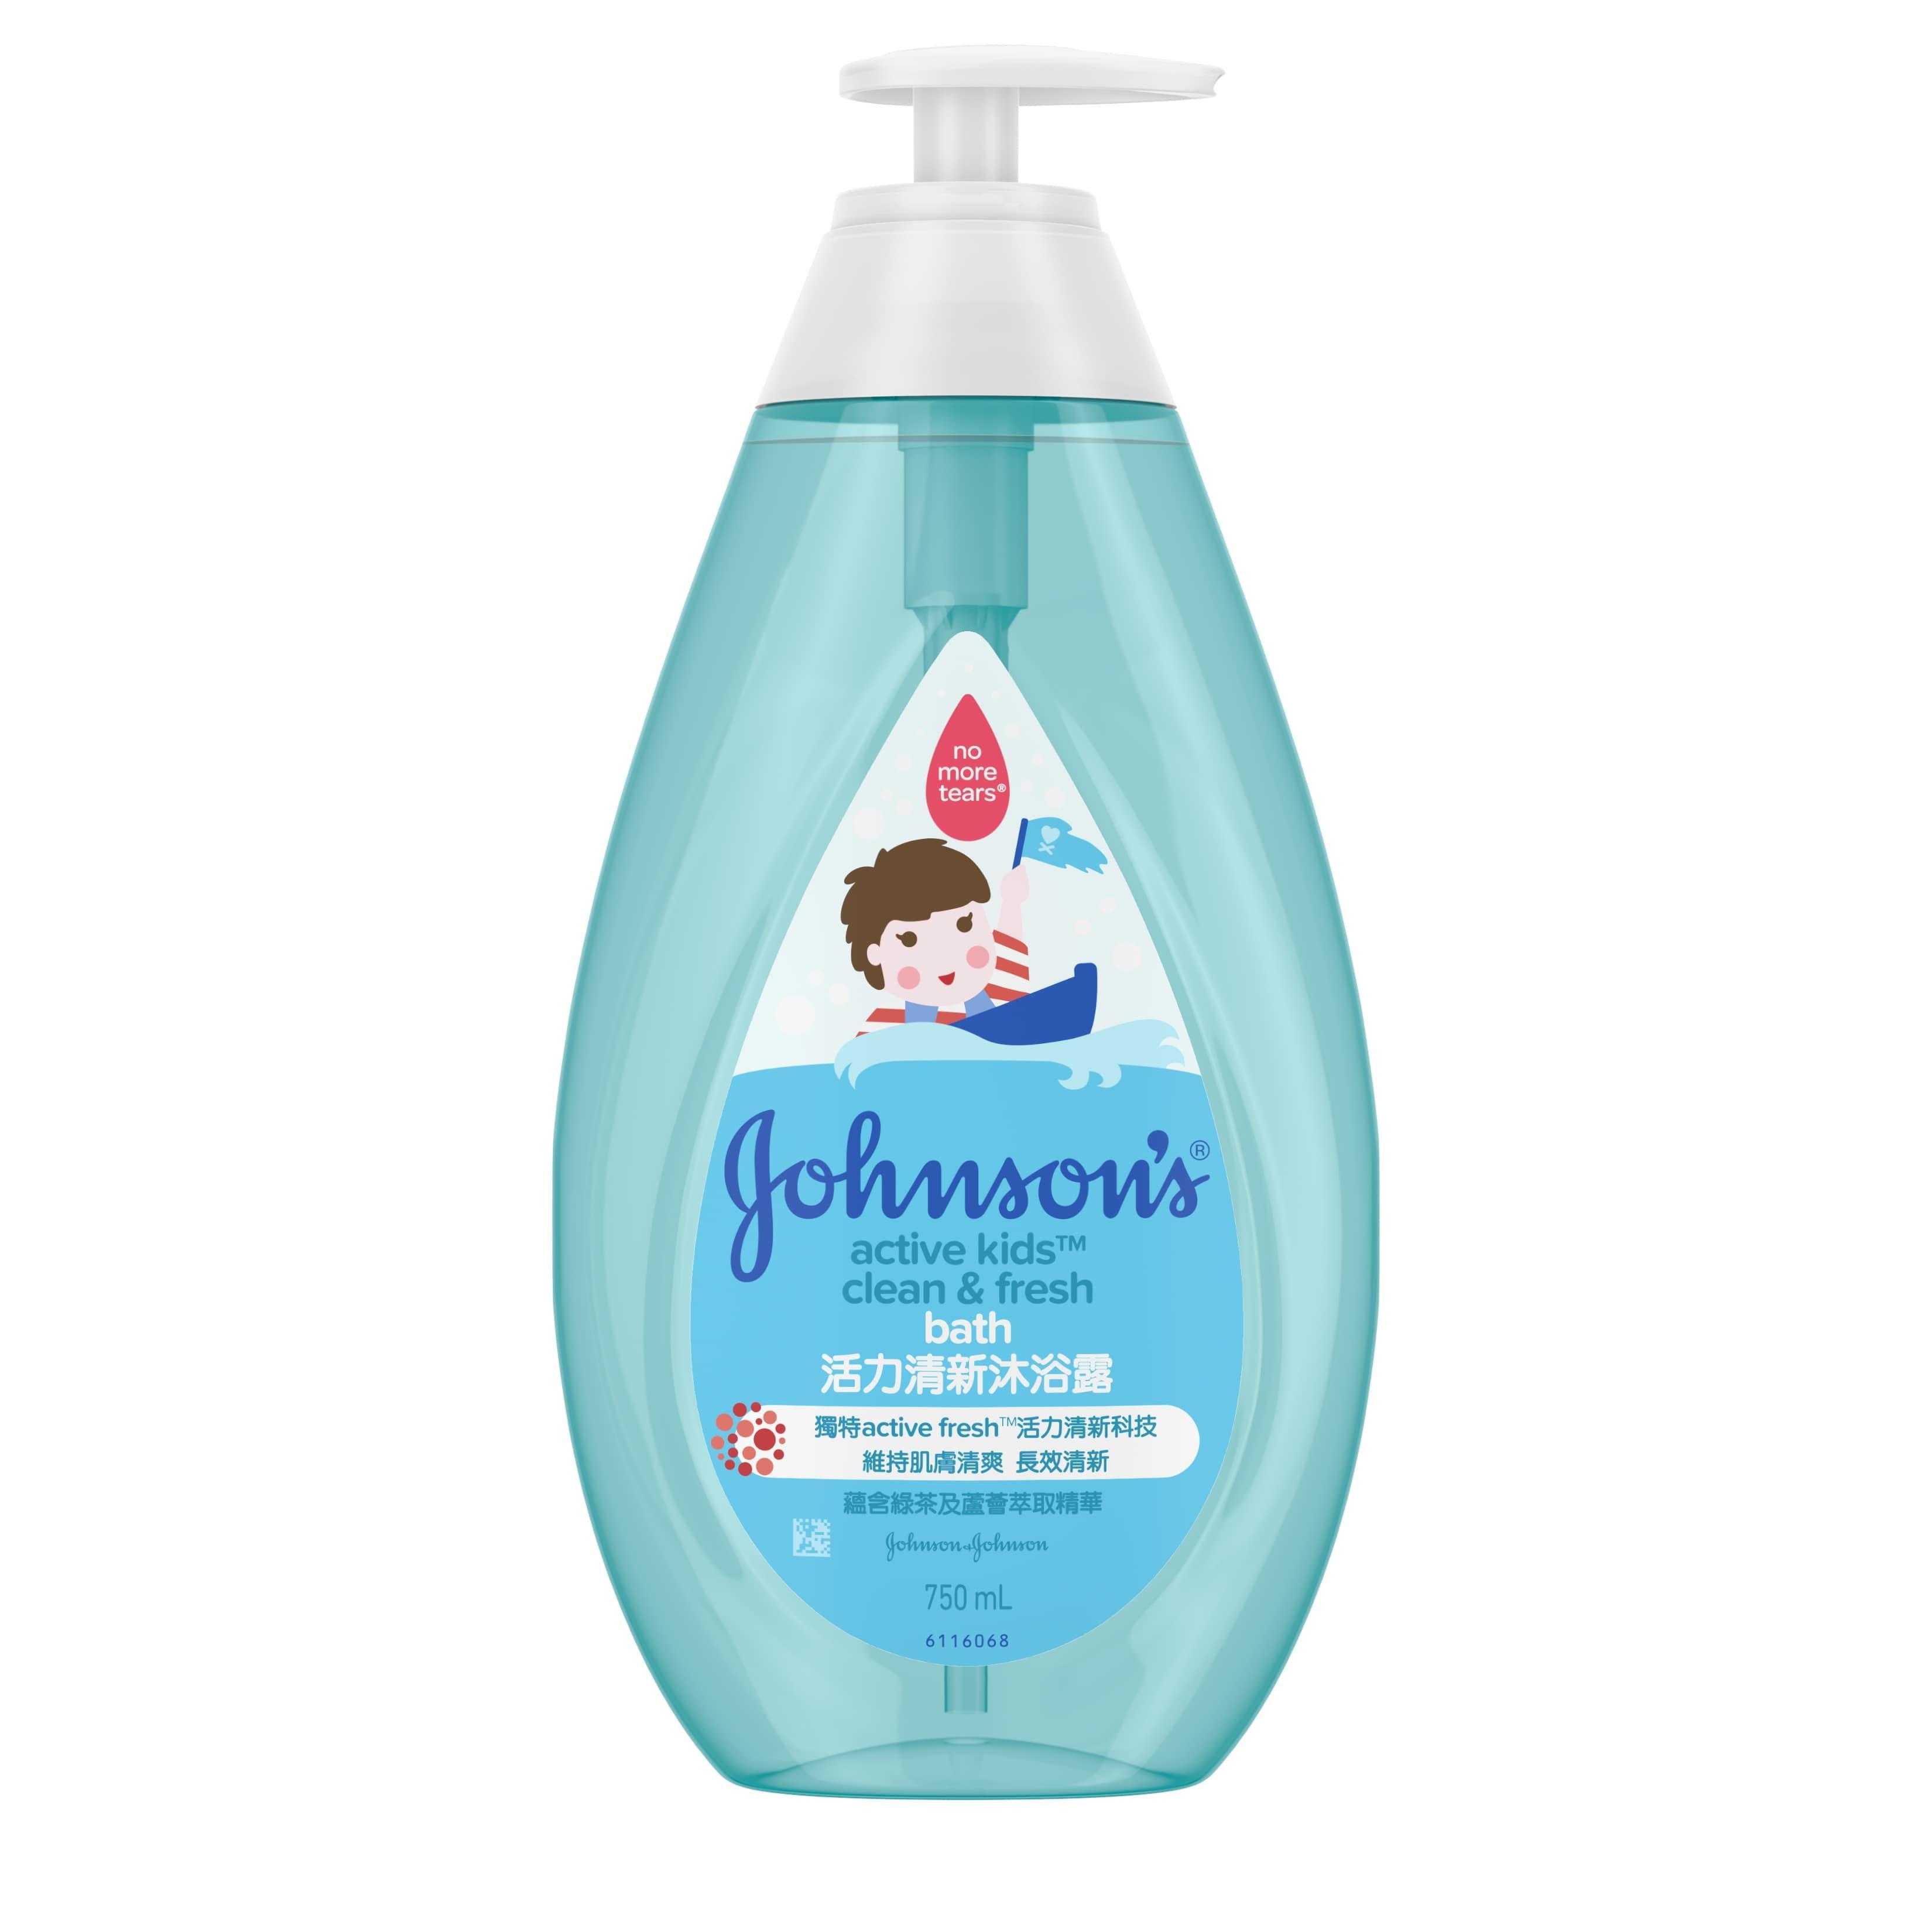 active-kids-clean-fresh-bath-750ml-front.jpg